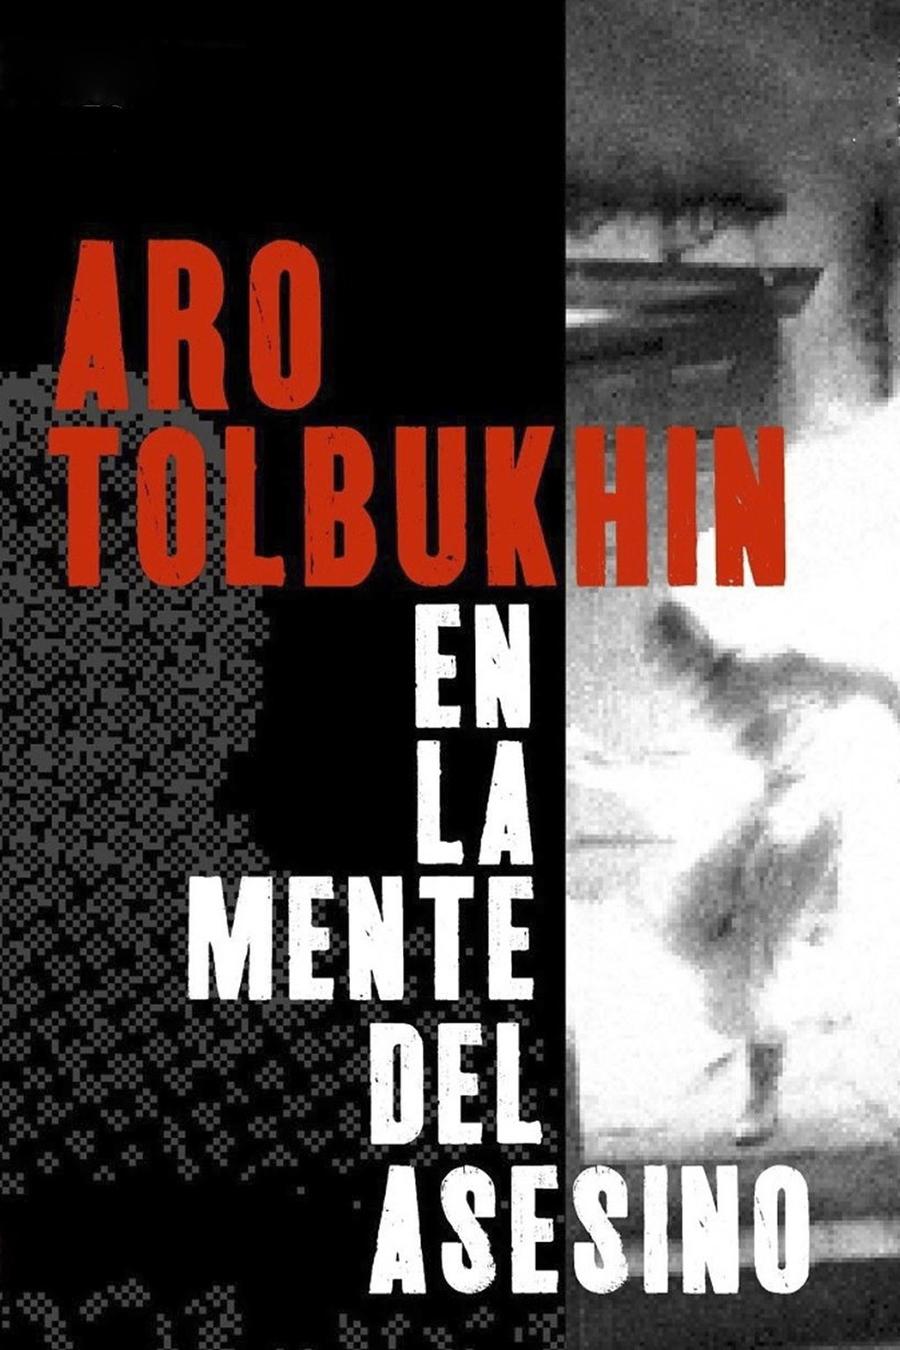 Aro Tolbukhin. Dins la ment de l'assassí